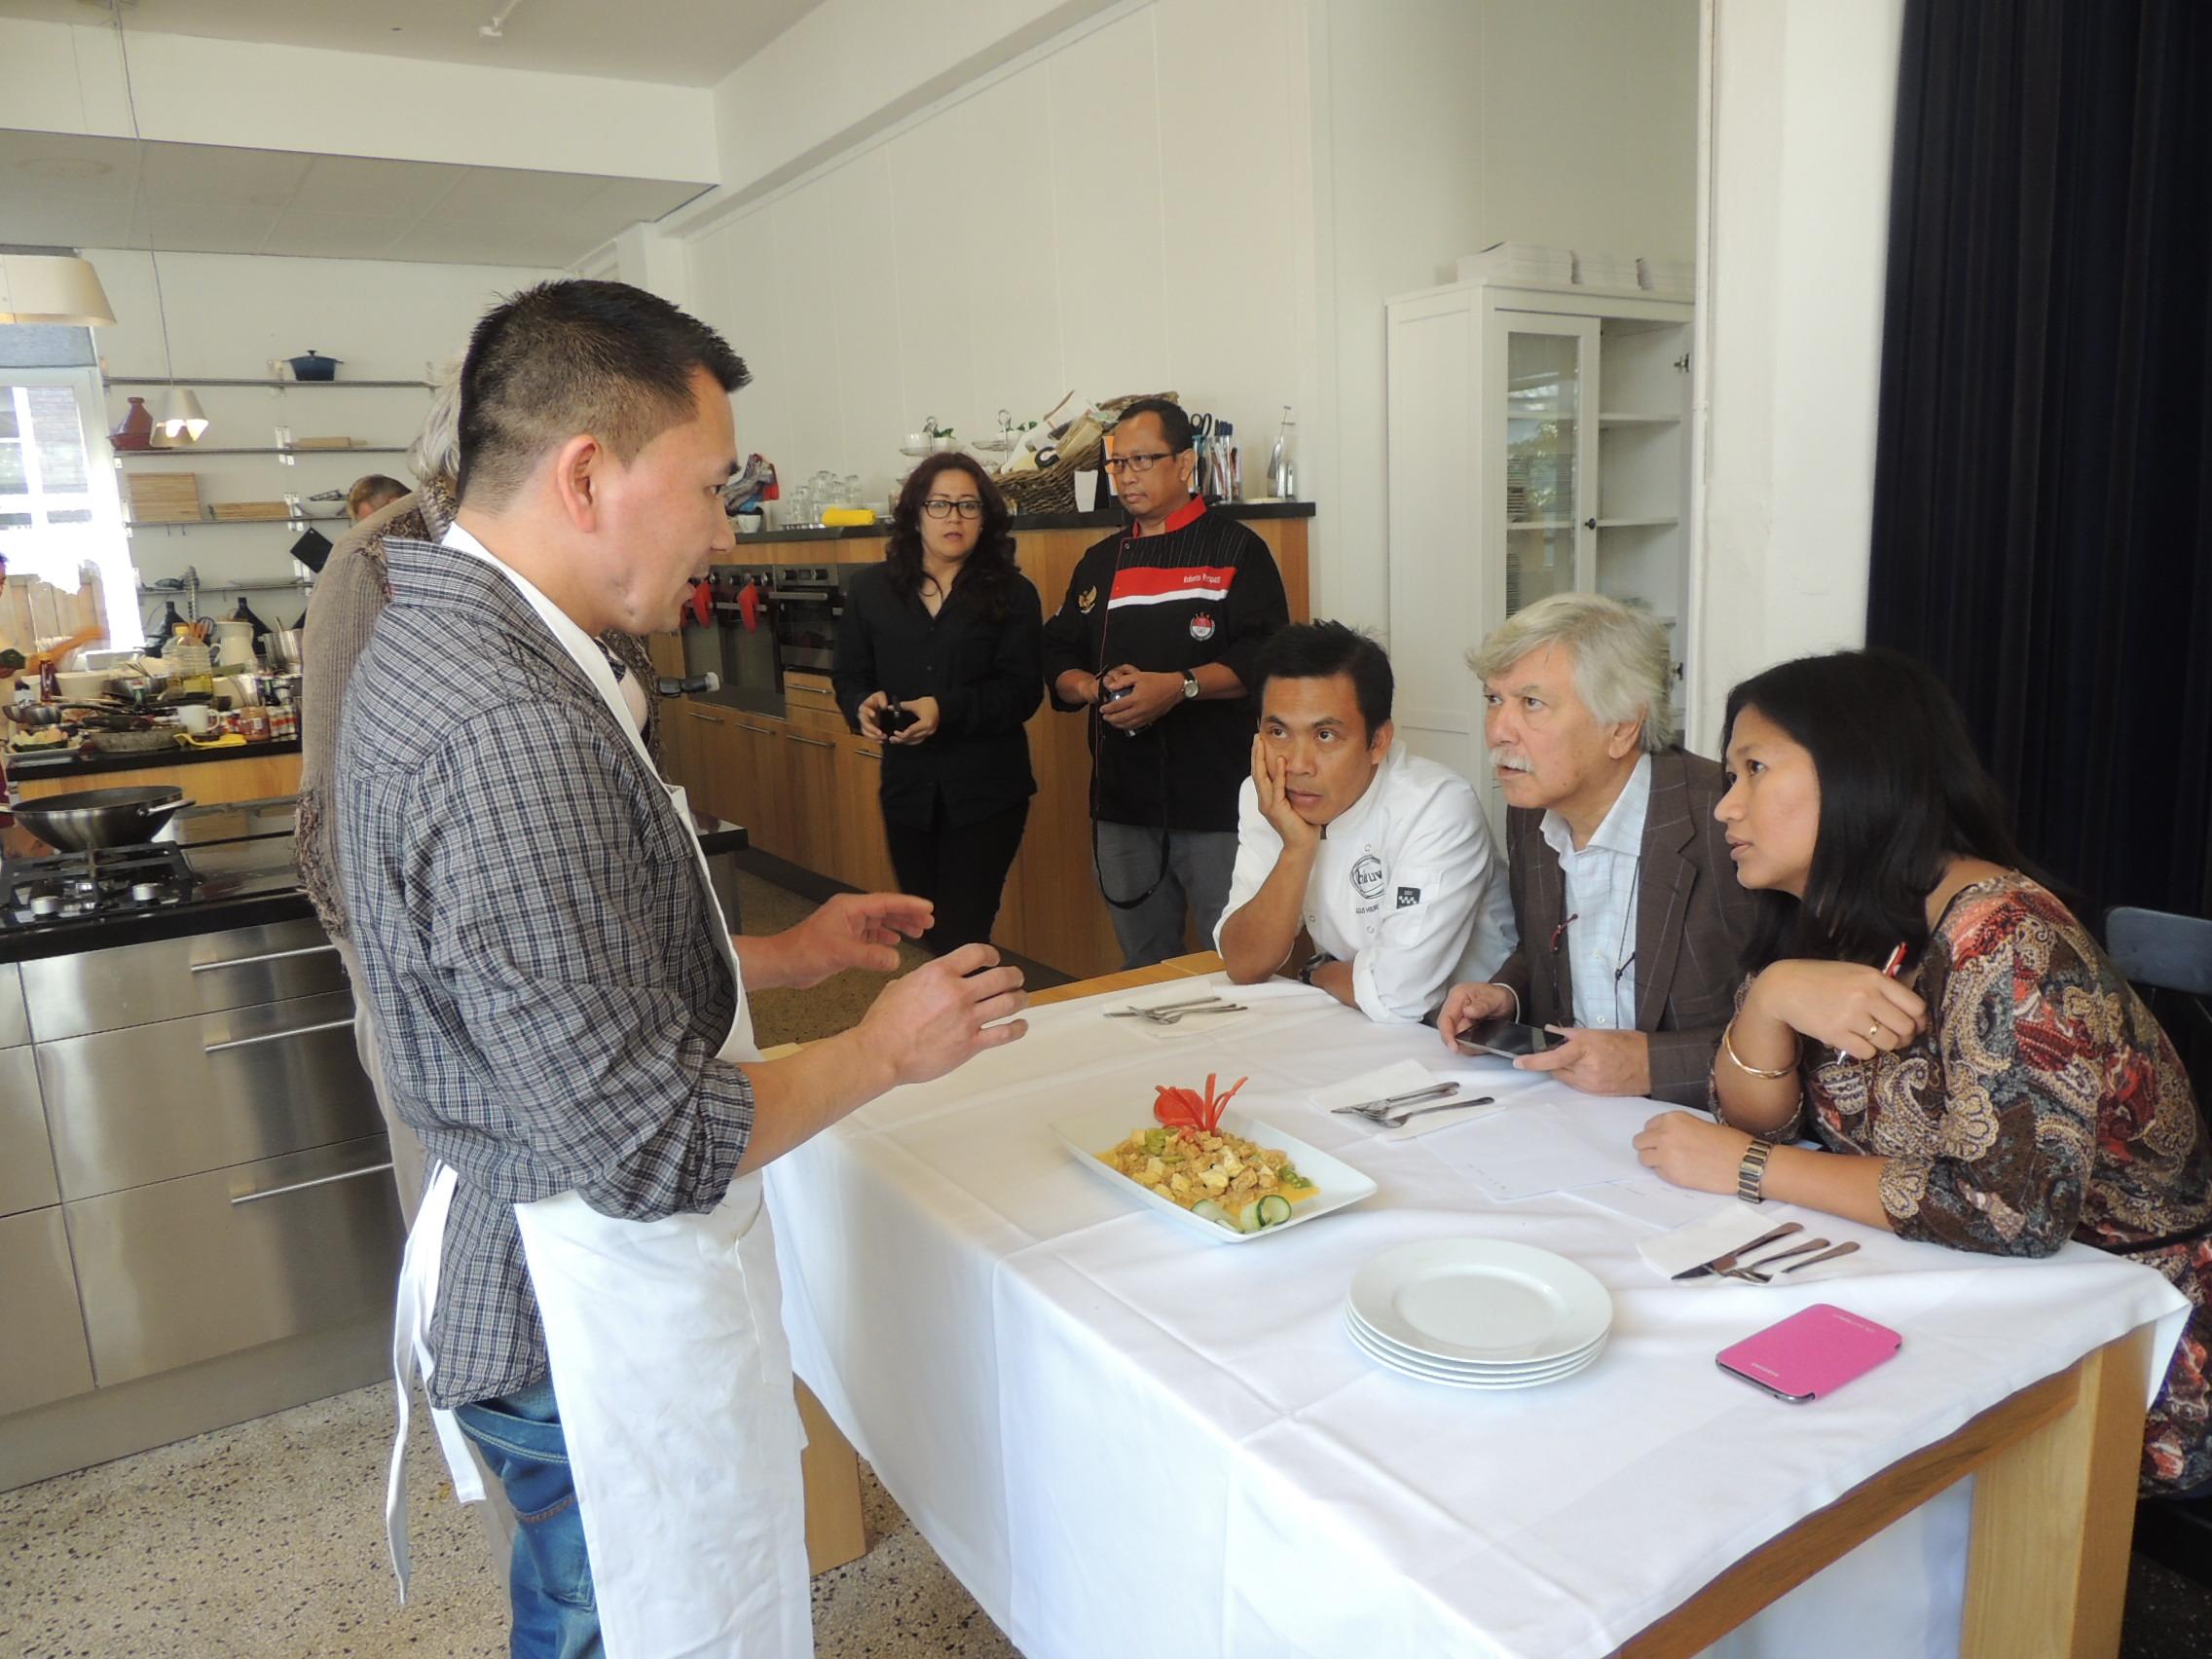 Bapak Agus Hermawan (Restoran Blauw), Bapak Benno R. Renaud (Asia Gastronomica), Ibu Detty Janssen (DJ's Kitchen 'n Shop)